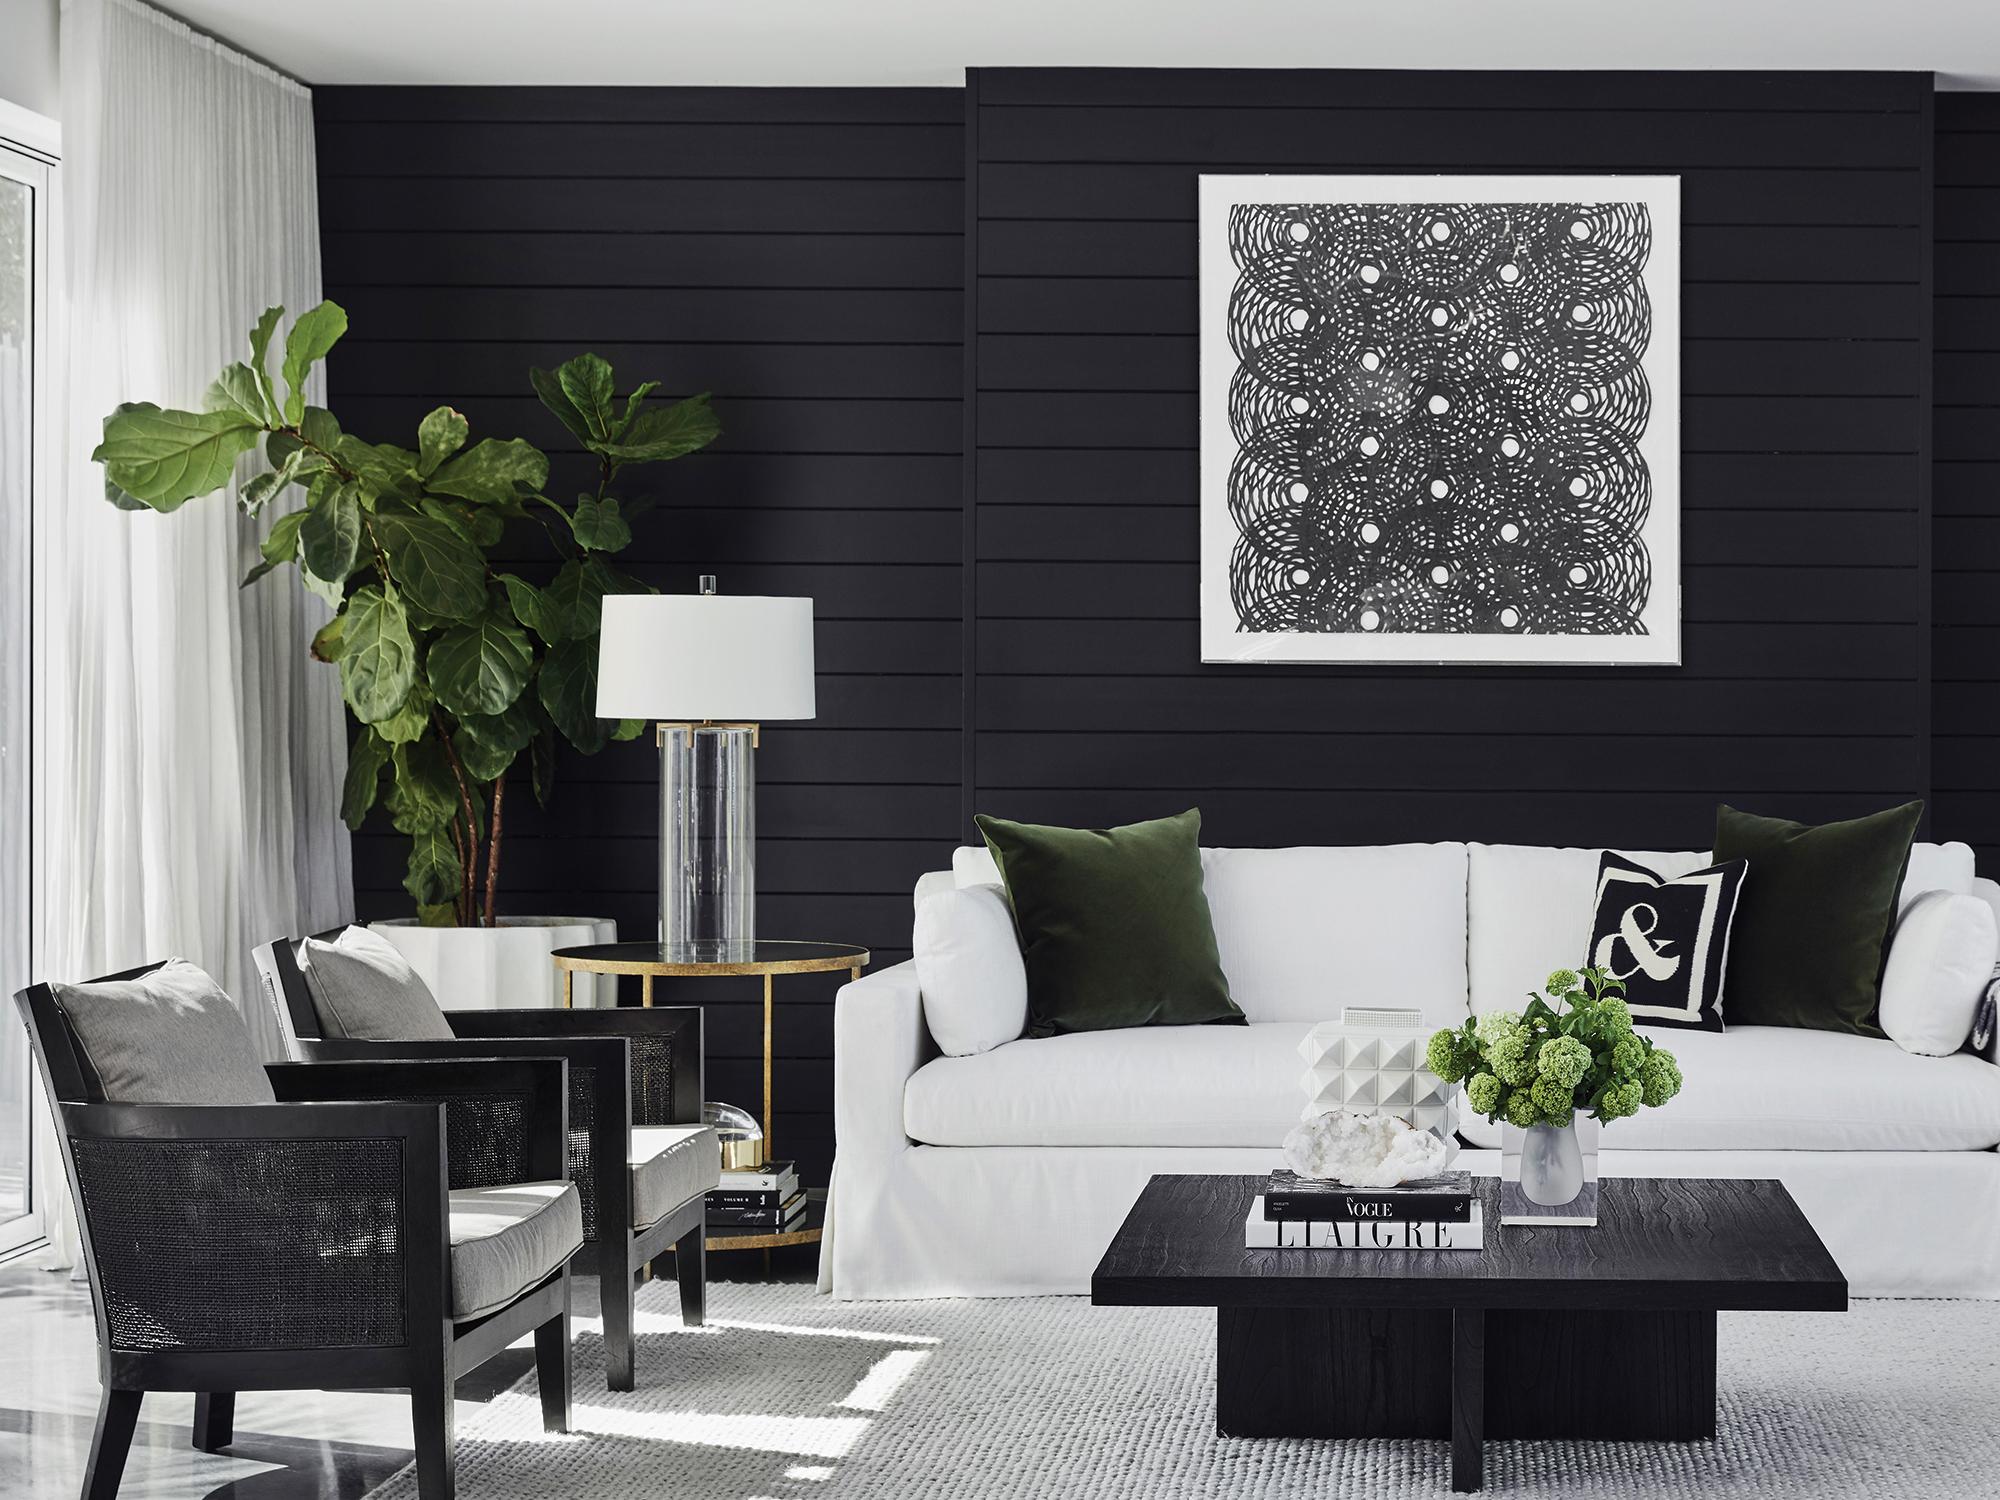 Famous Interior Designers: Top 4 From Australia | Architecture & Design